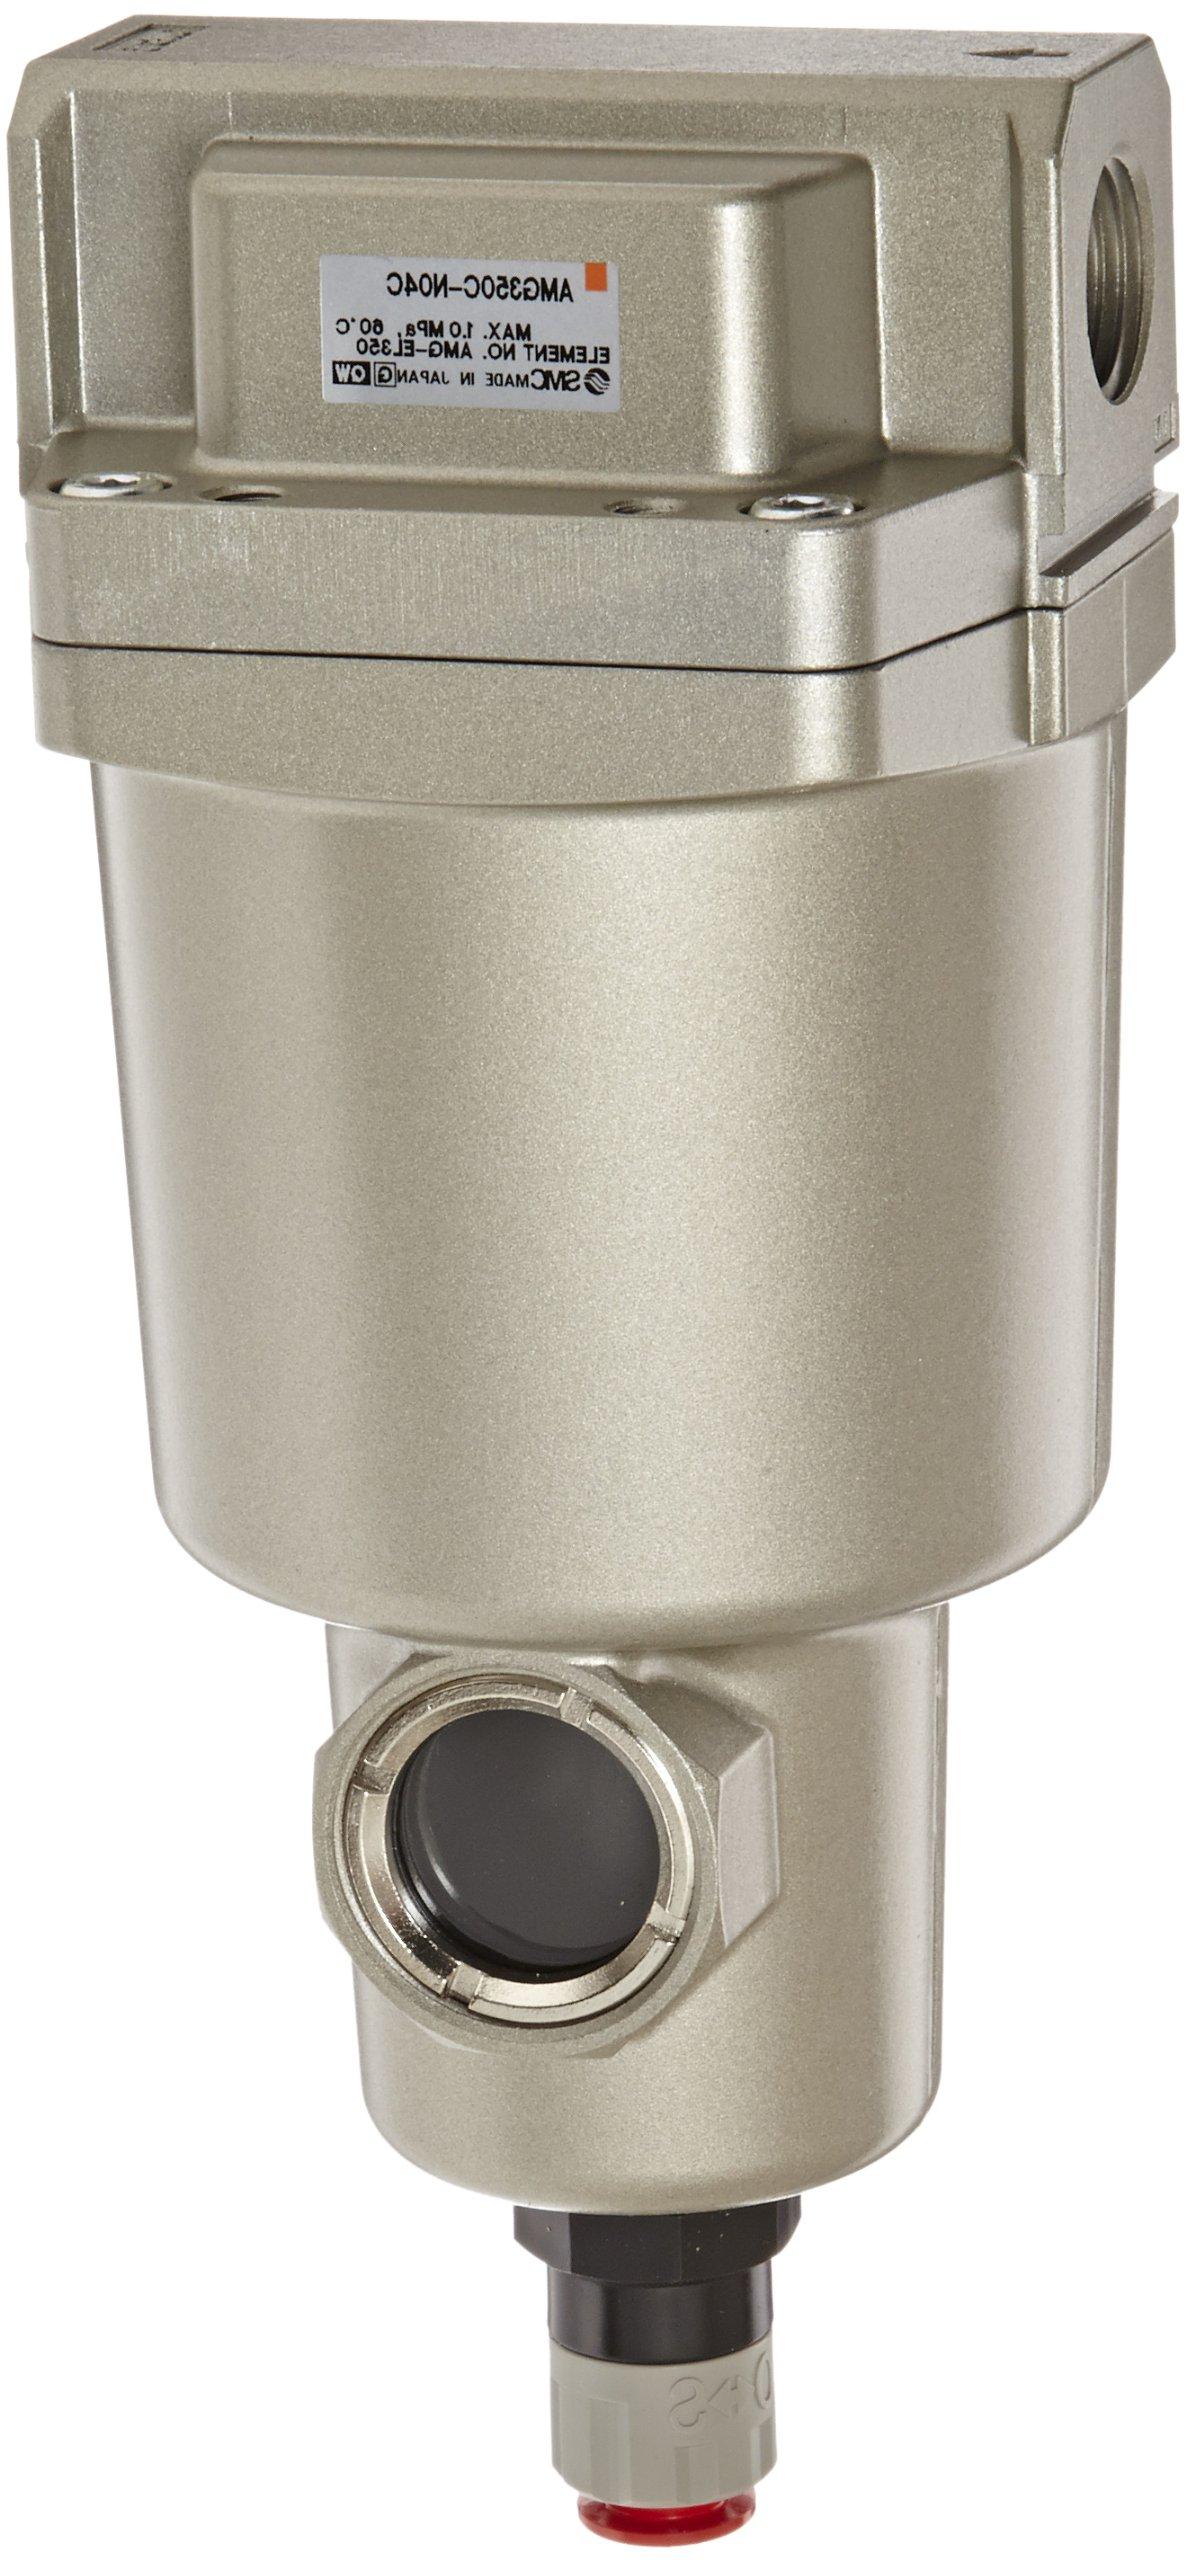 SMC AMG350C-N04C Water Separator, N.C. Auto Drain, 1,500 L/min, 1/2'' NPT by SMC